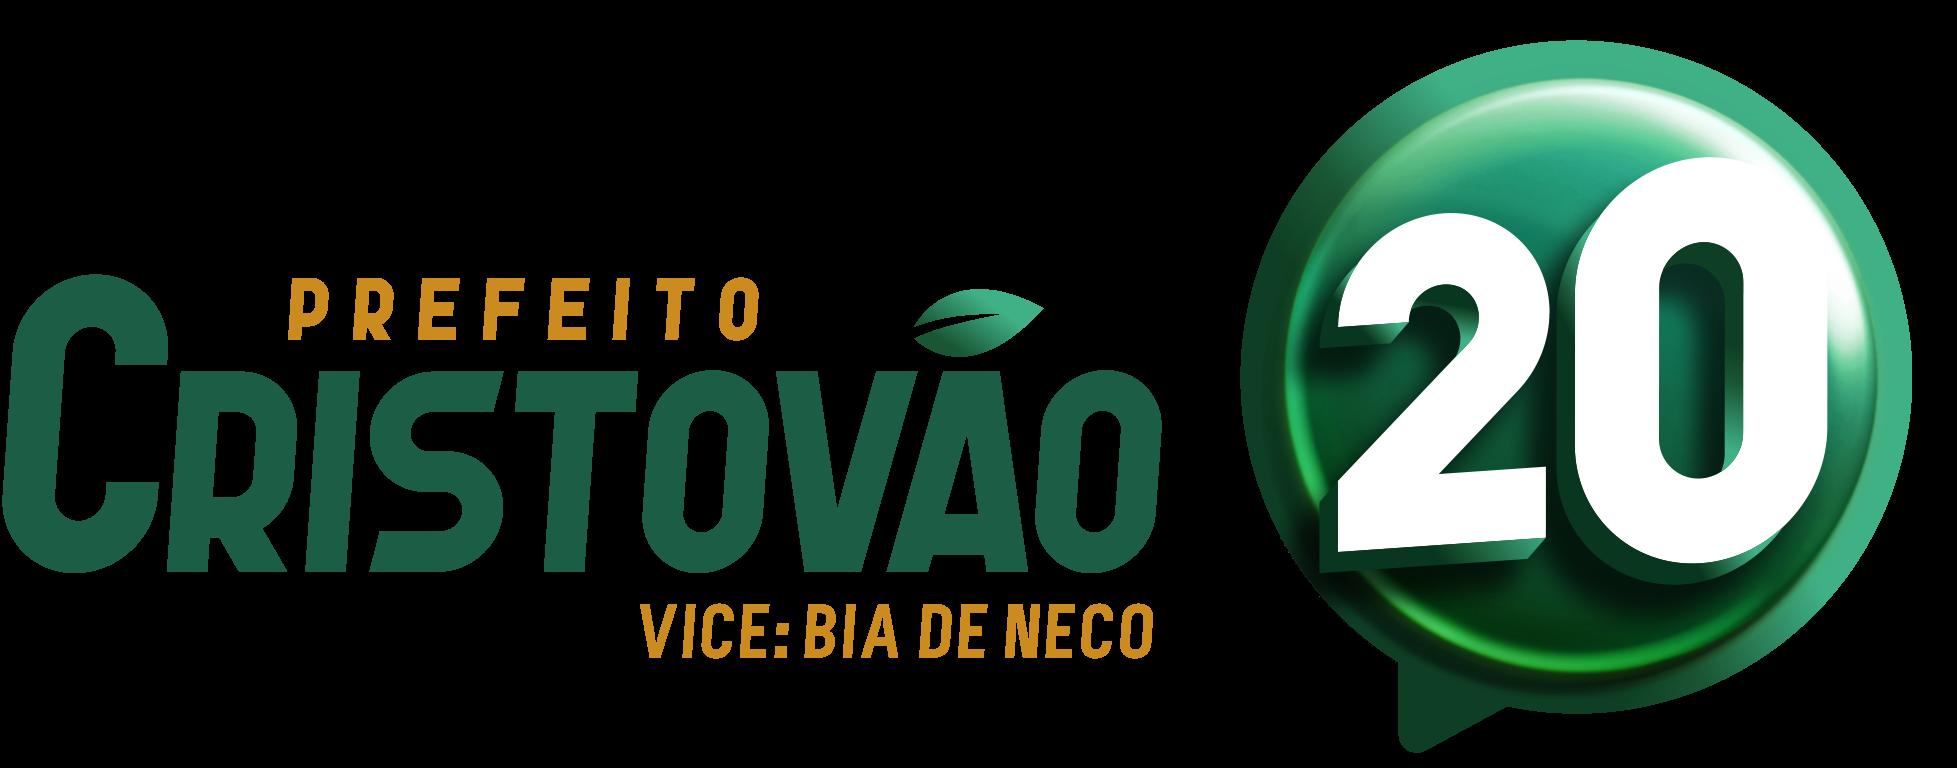 Prefeito Cristovão - Logotipo e Número -